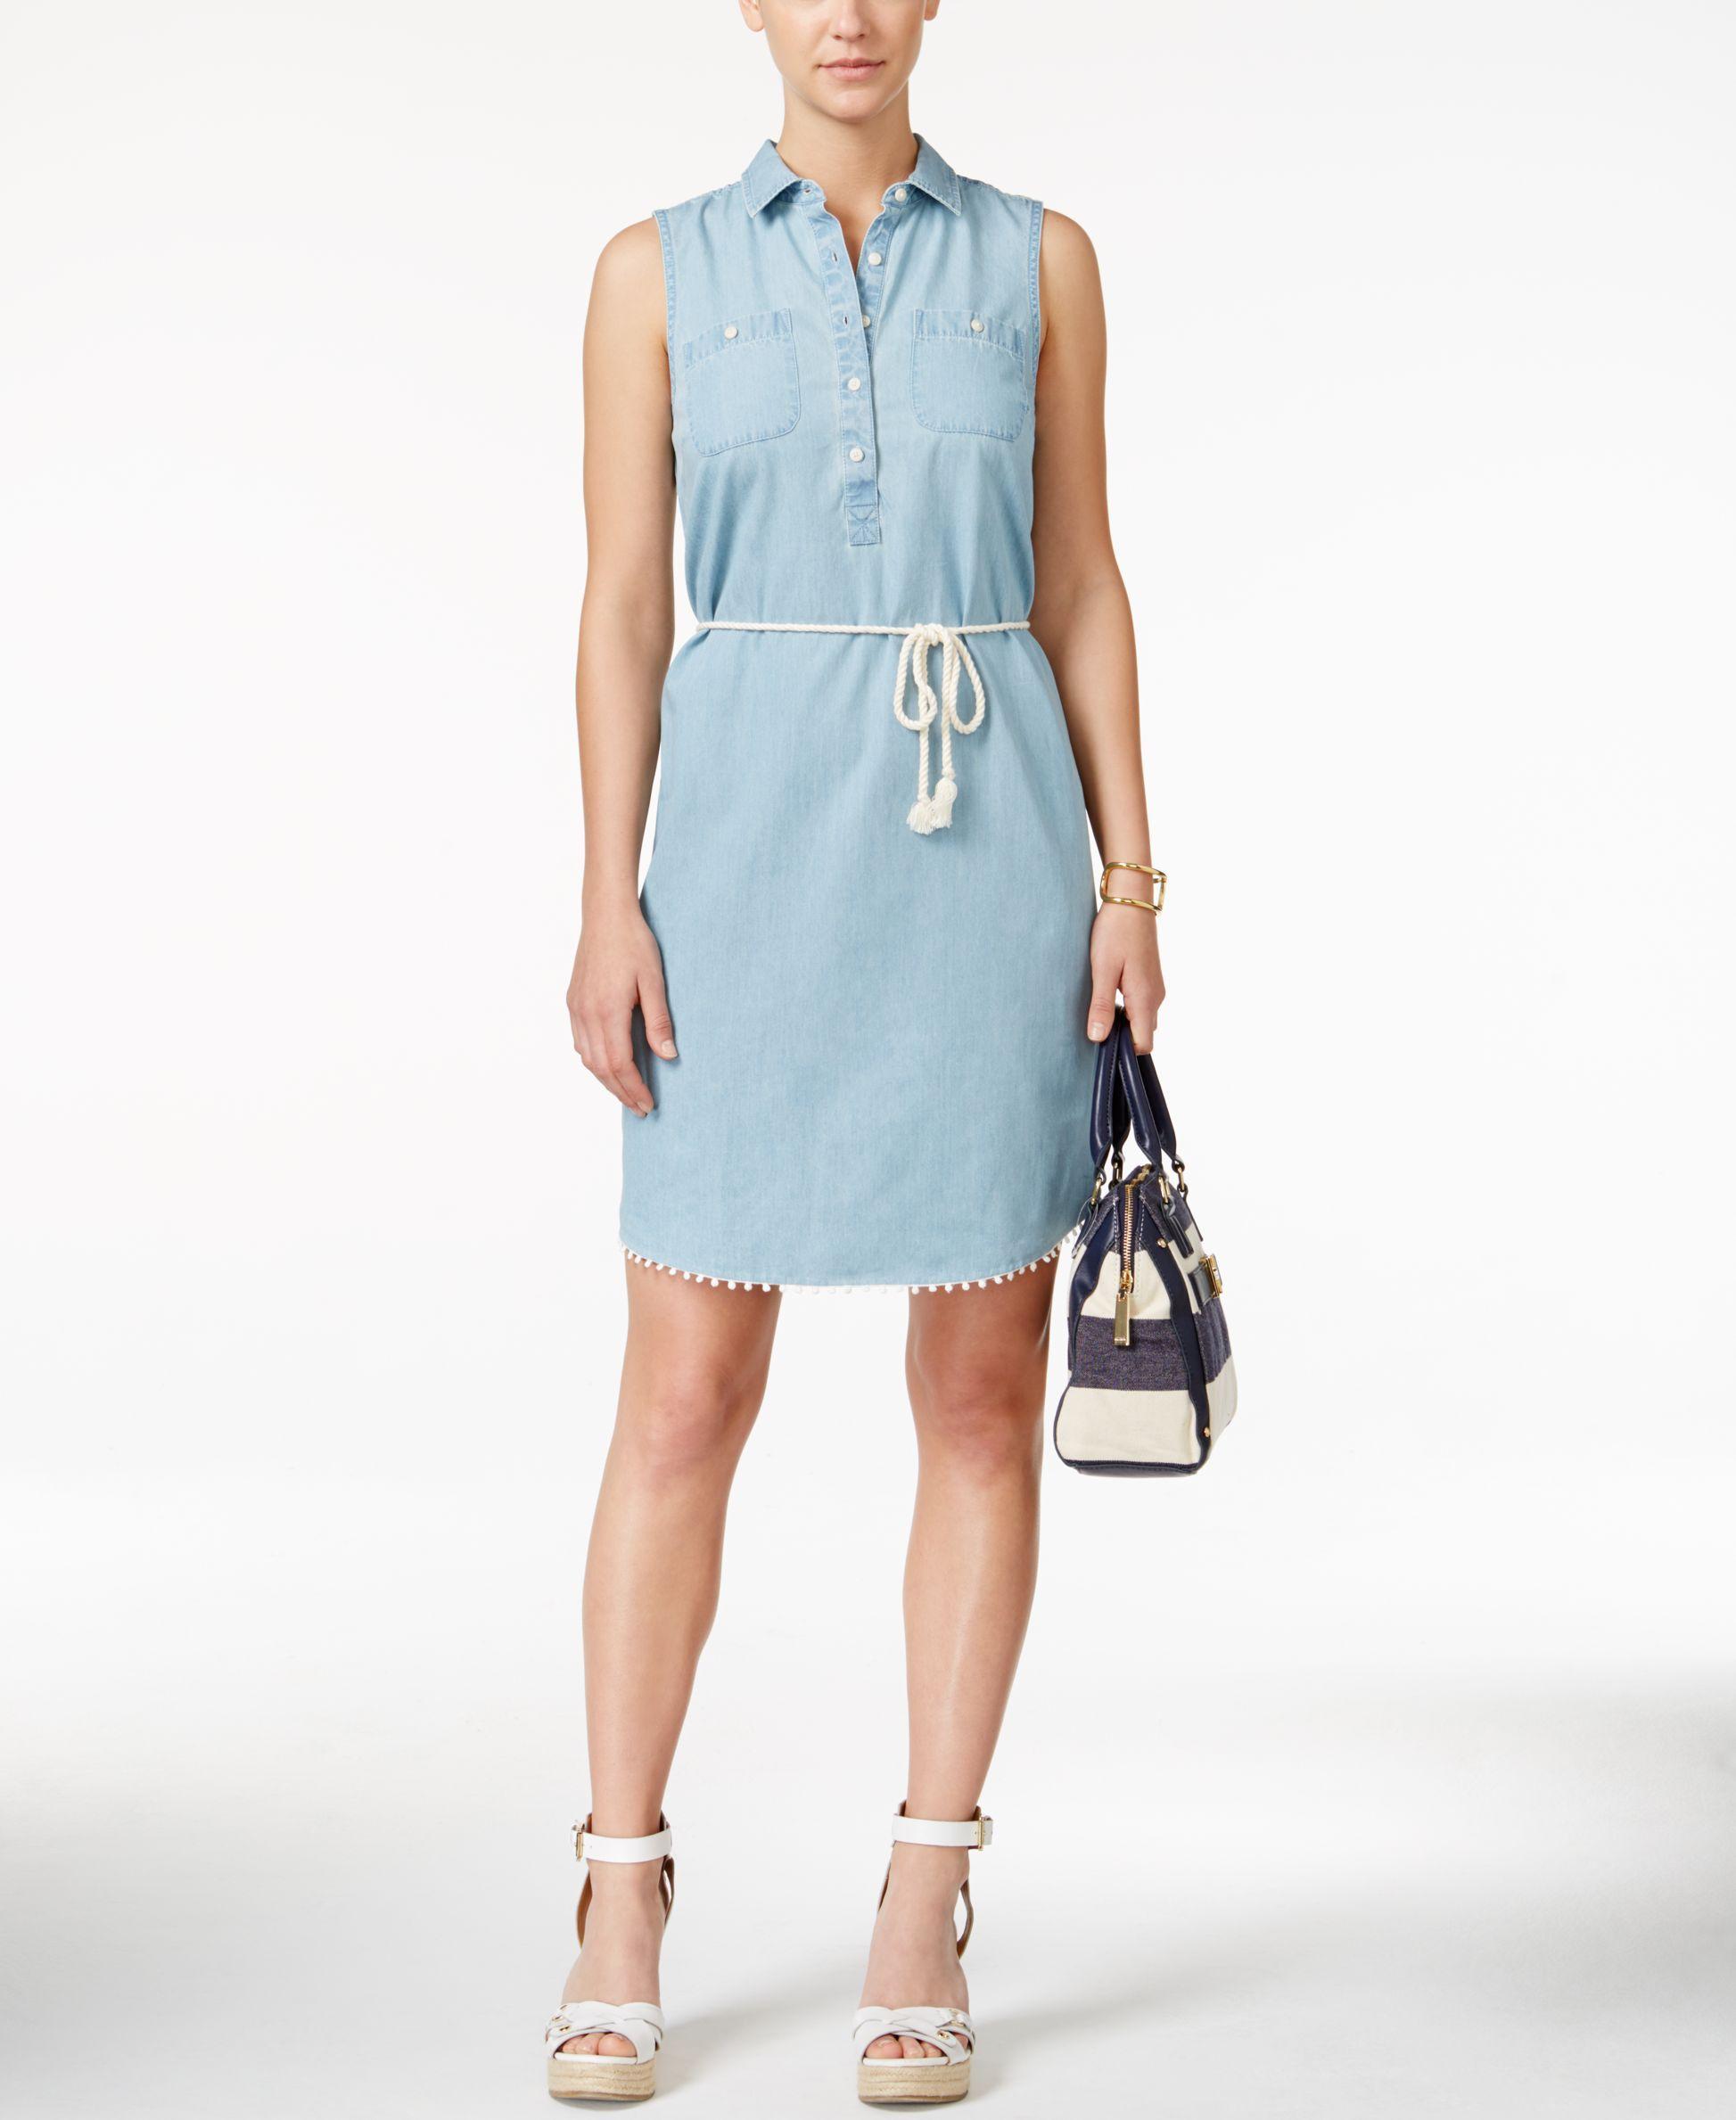 ded79b8788 Tommy Hilfiger Sleeveless Rope-Belt Denim Shirt Dress | Products ...